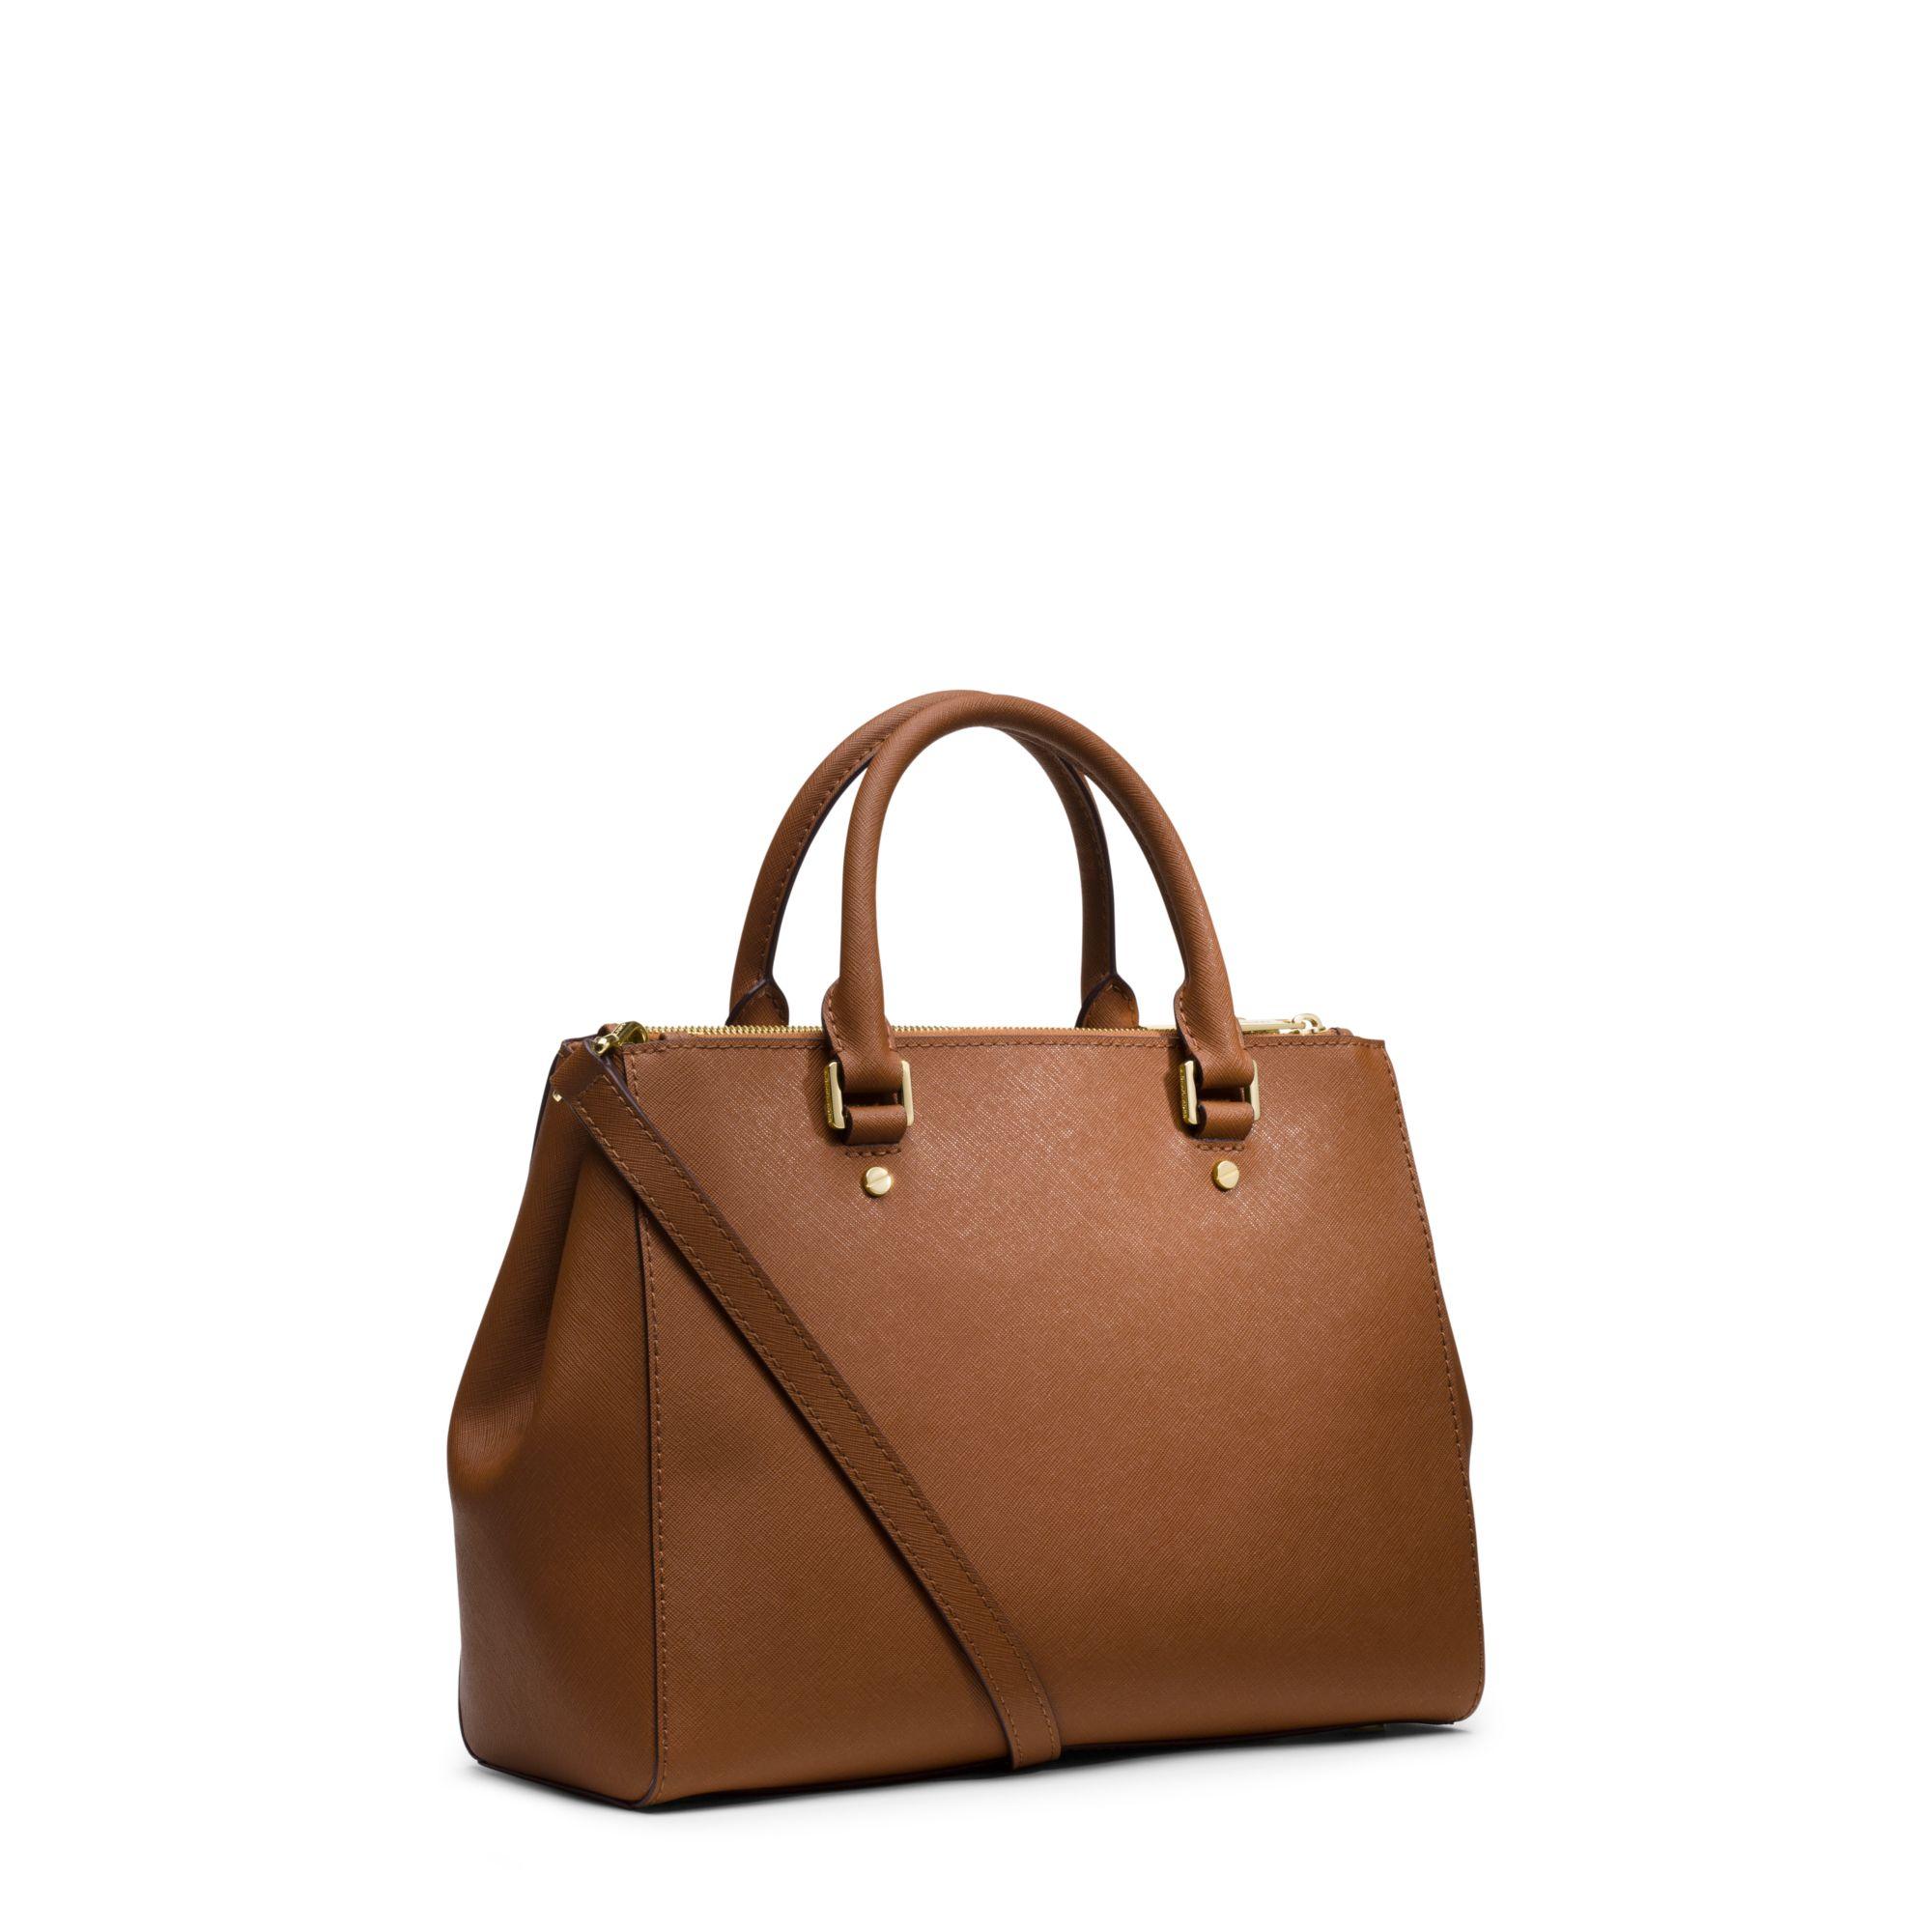 db54fdf1ac8a Lyst - Michael Kors Sutton Medium Saffiano Leather Satchel in Brown